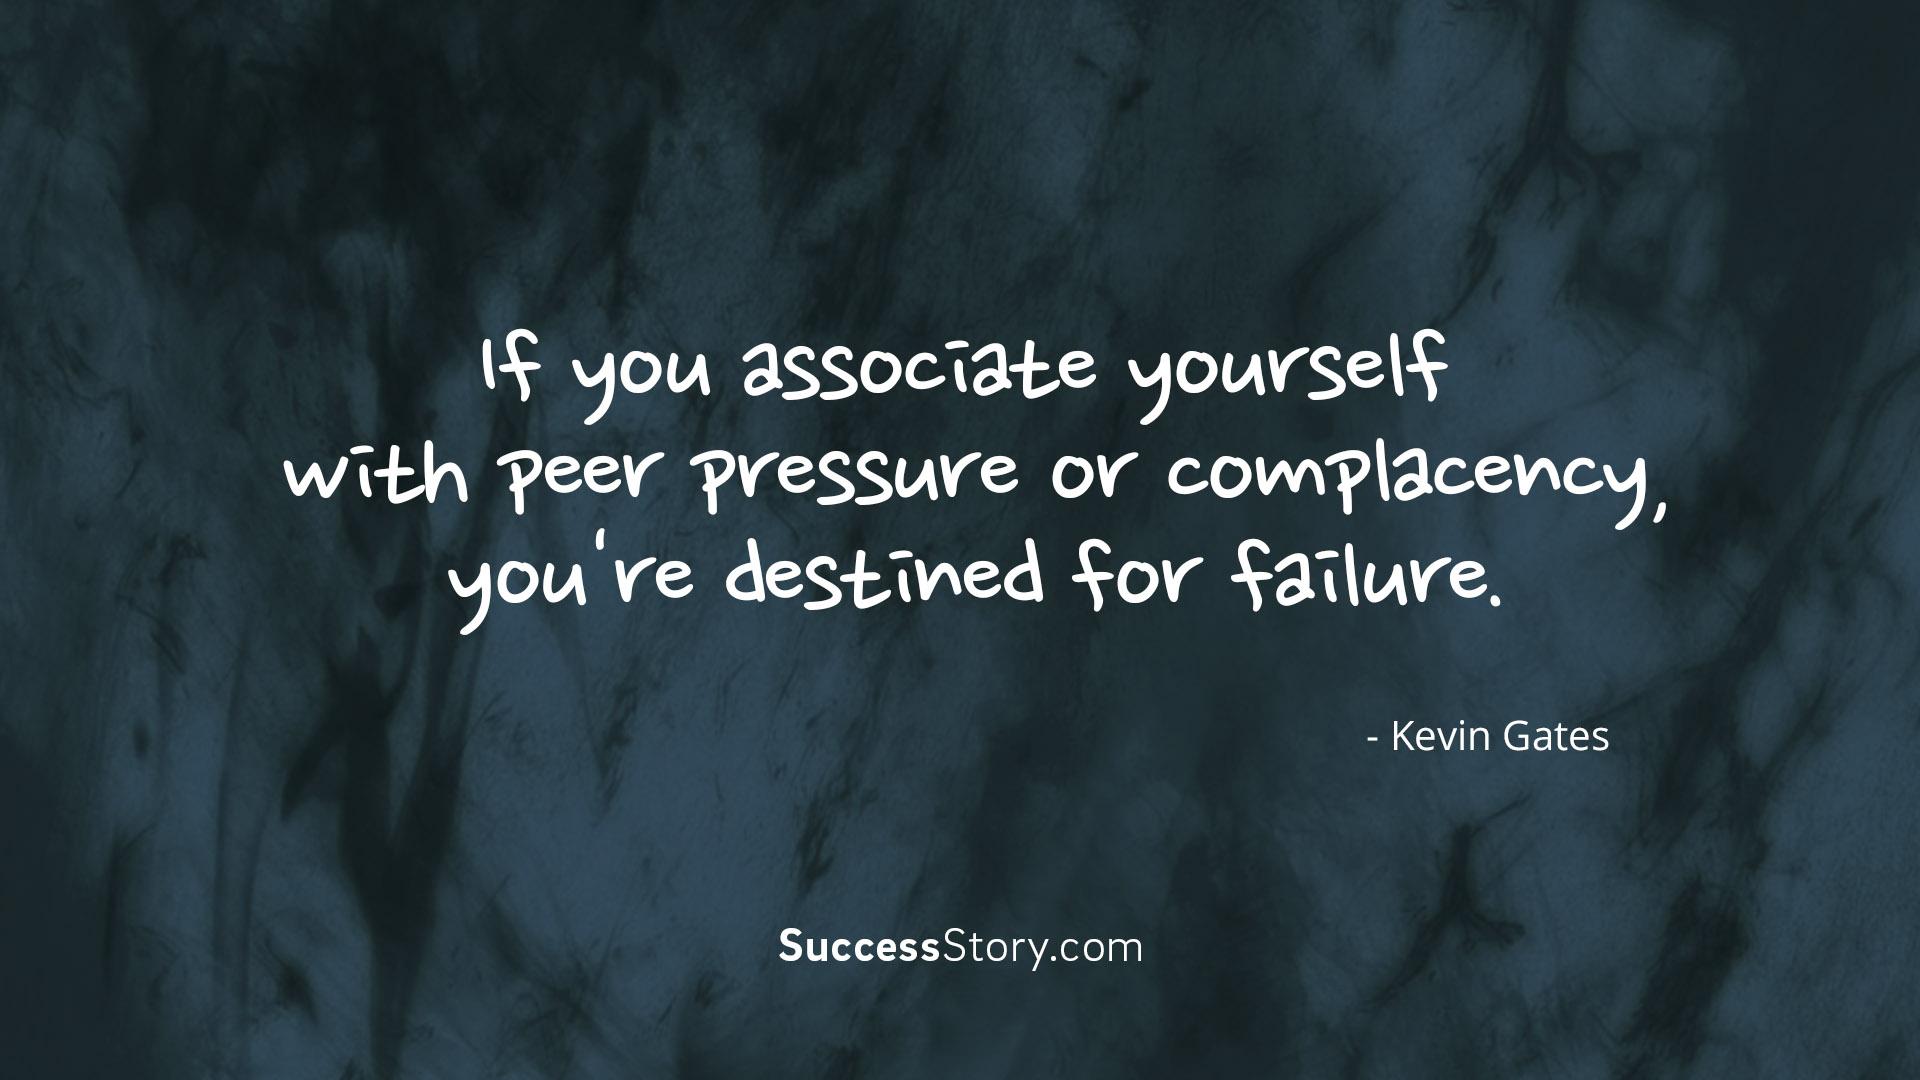 If you associate